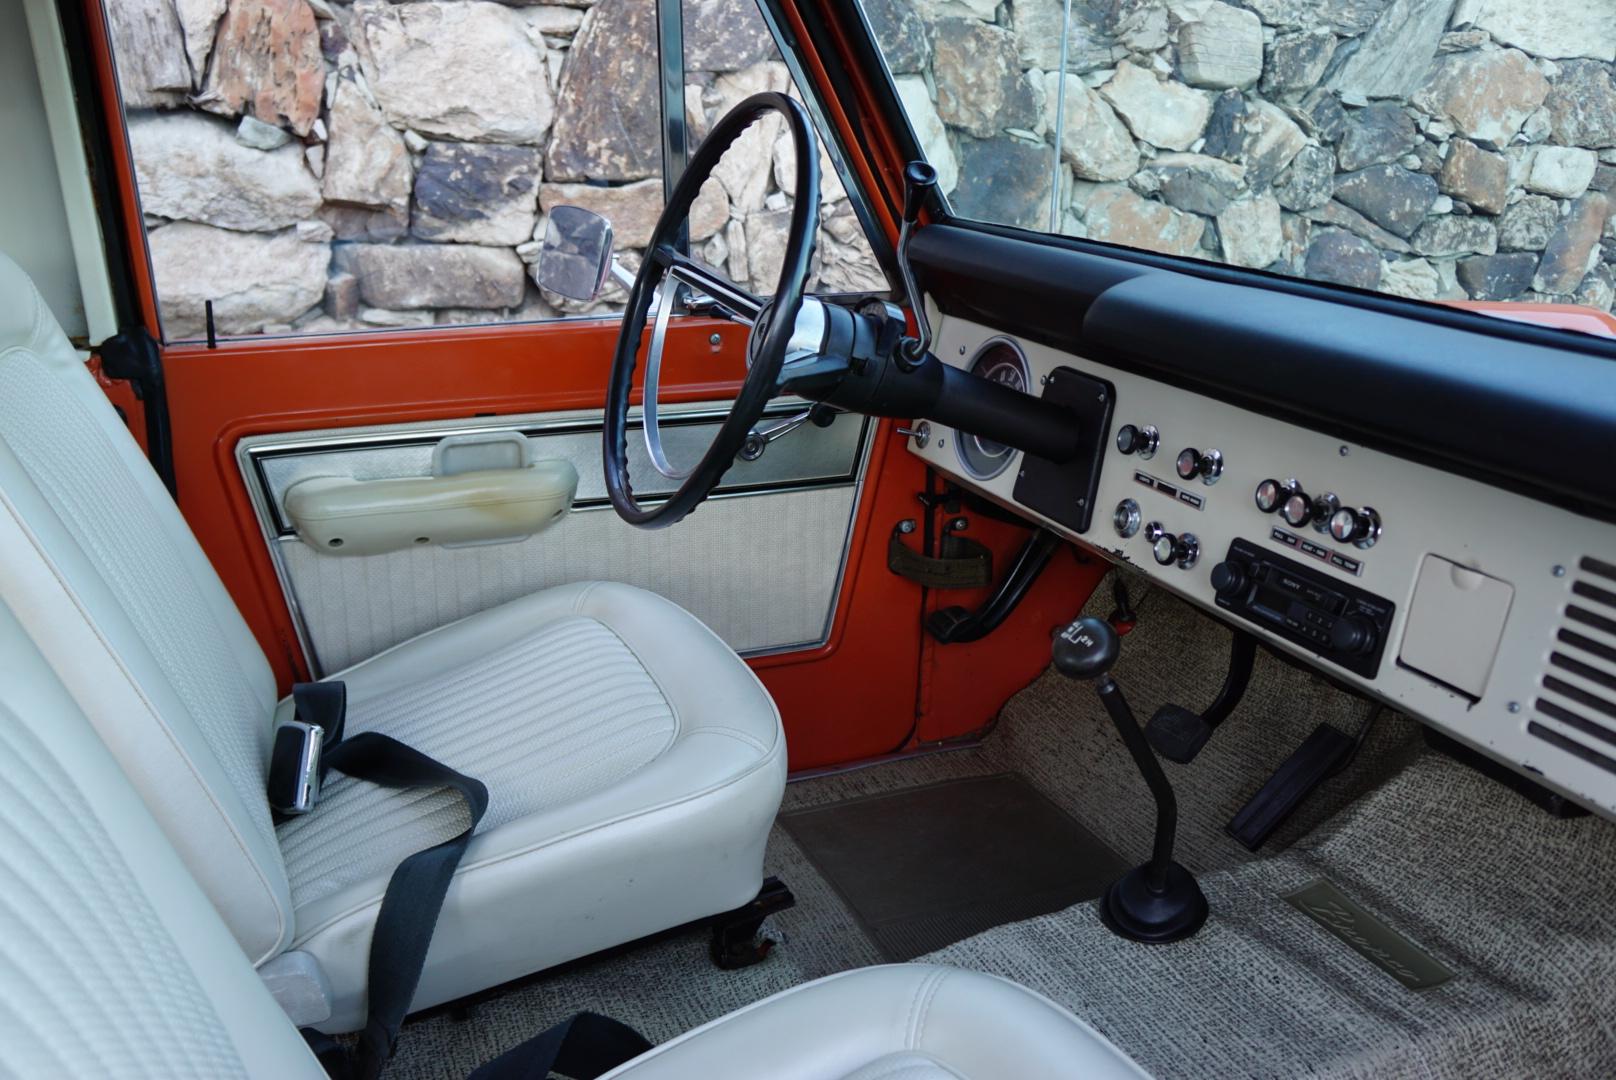 1974 Ford Bronco interior